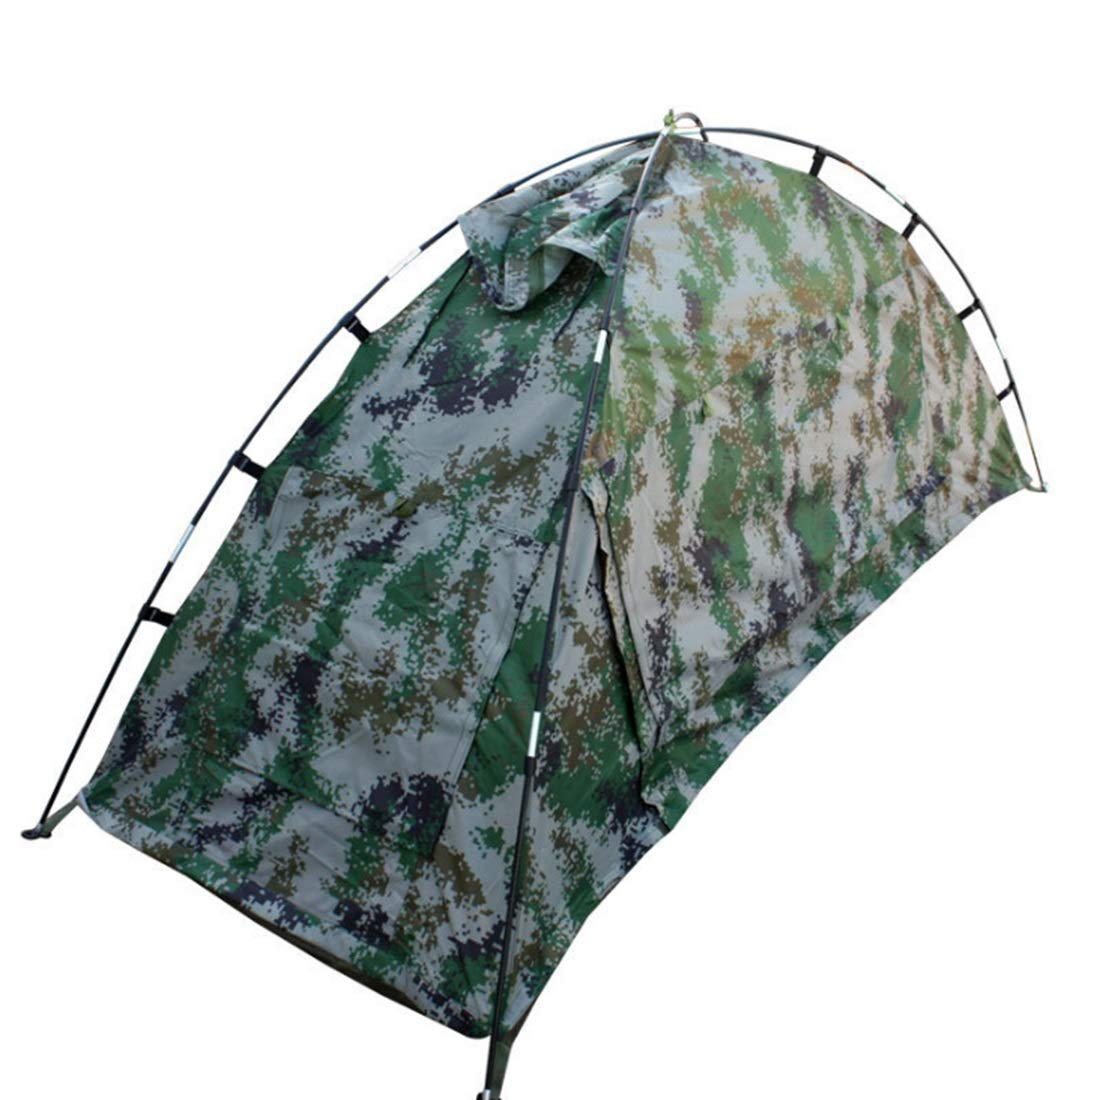 LilyAngel 屋外キャンプのための1人の迷彩テント  Camouflage B07MXF981L